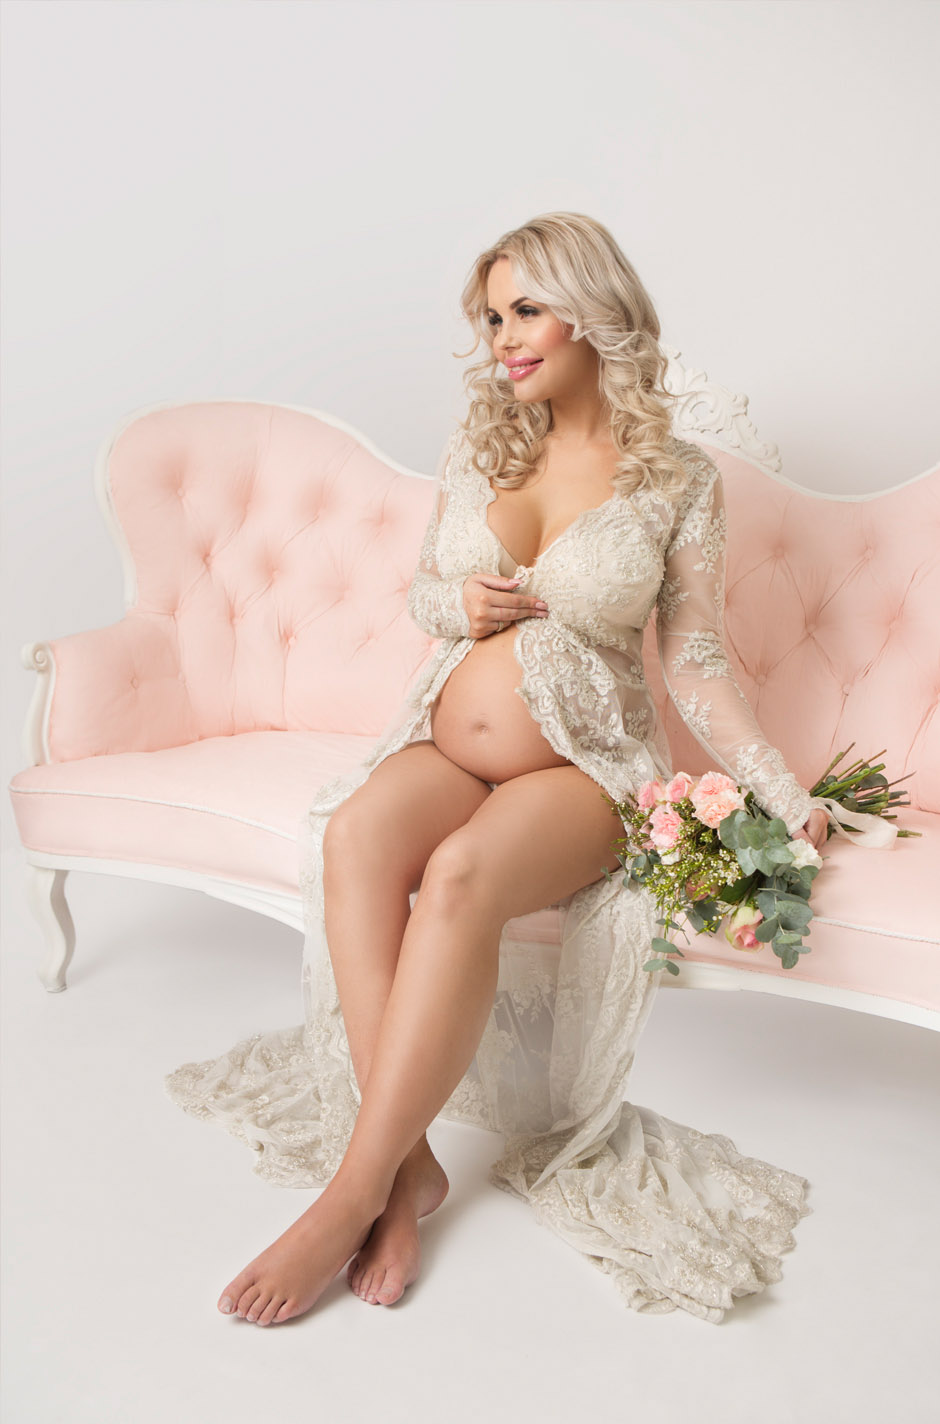 Se vår temabrosjyre for hvordan vi fotograferer med blomstrer til gravidfotografering.